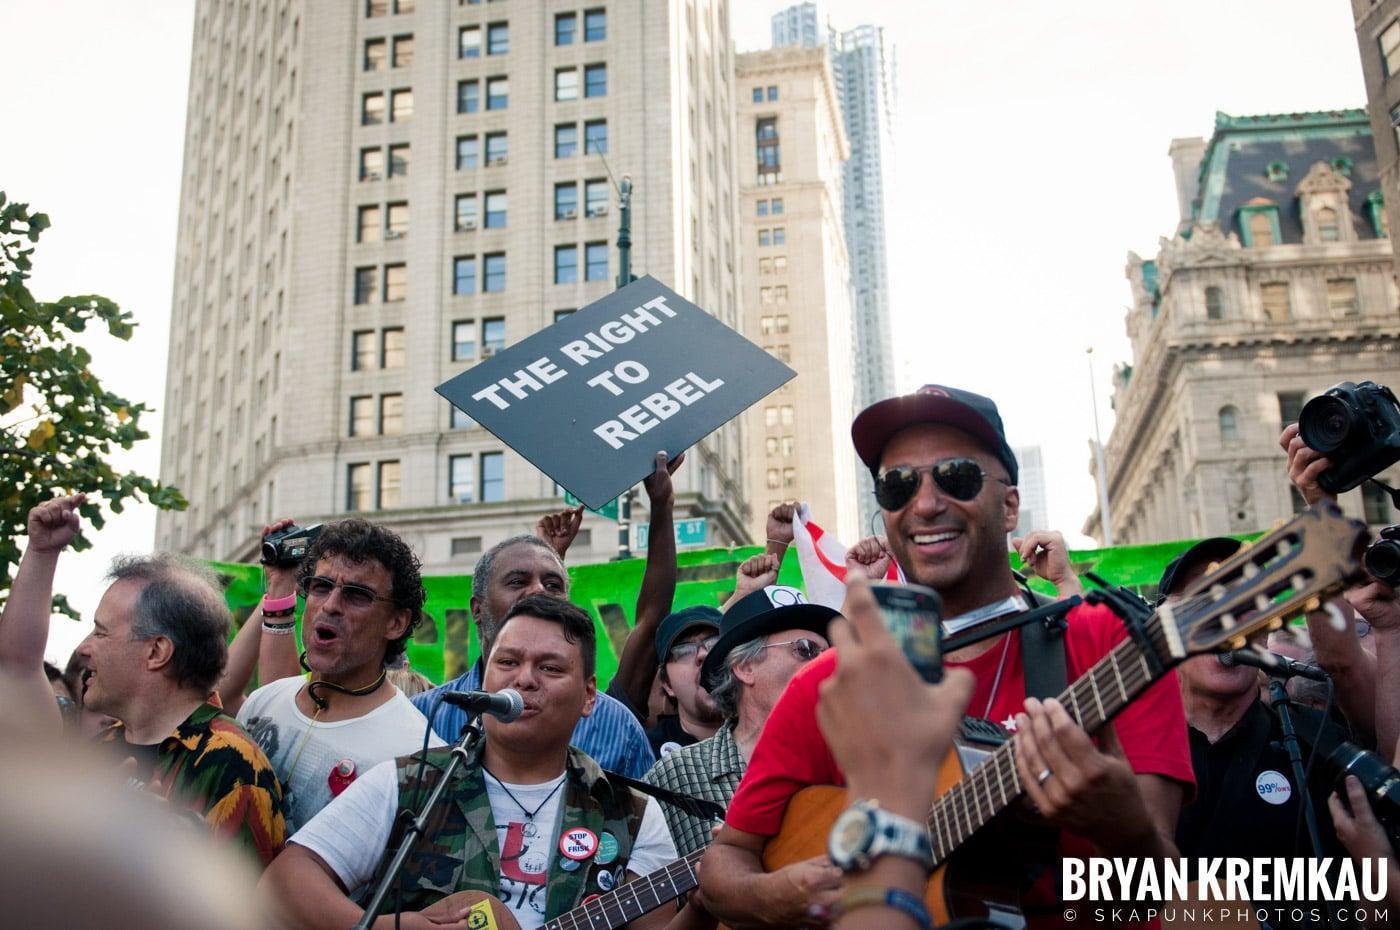 Tom Morello @ Occupy Wall Street Anniversary Concert, Foley Square, NYC - 9.16.12 (7)